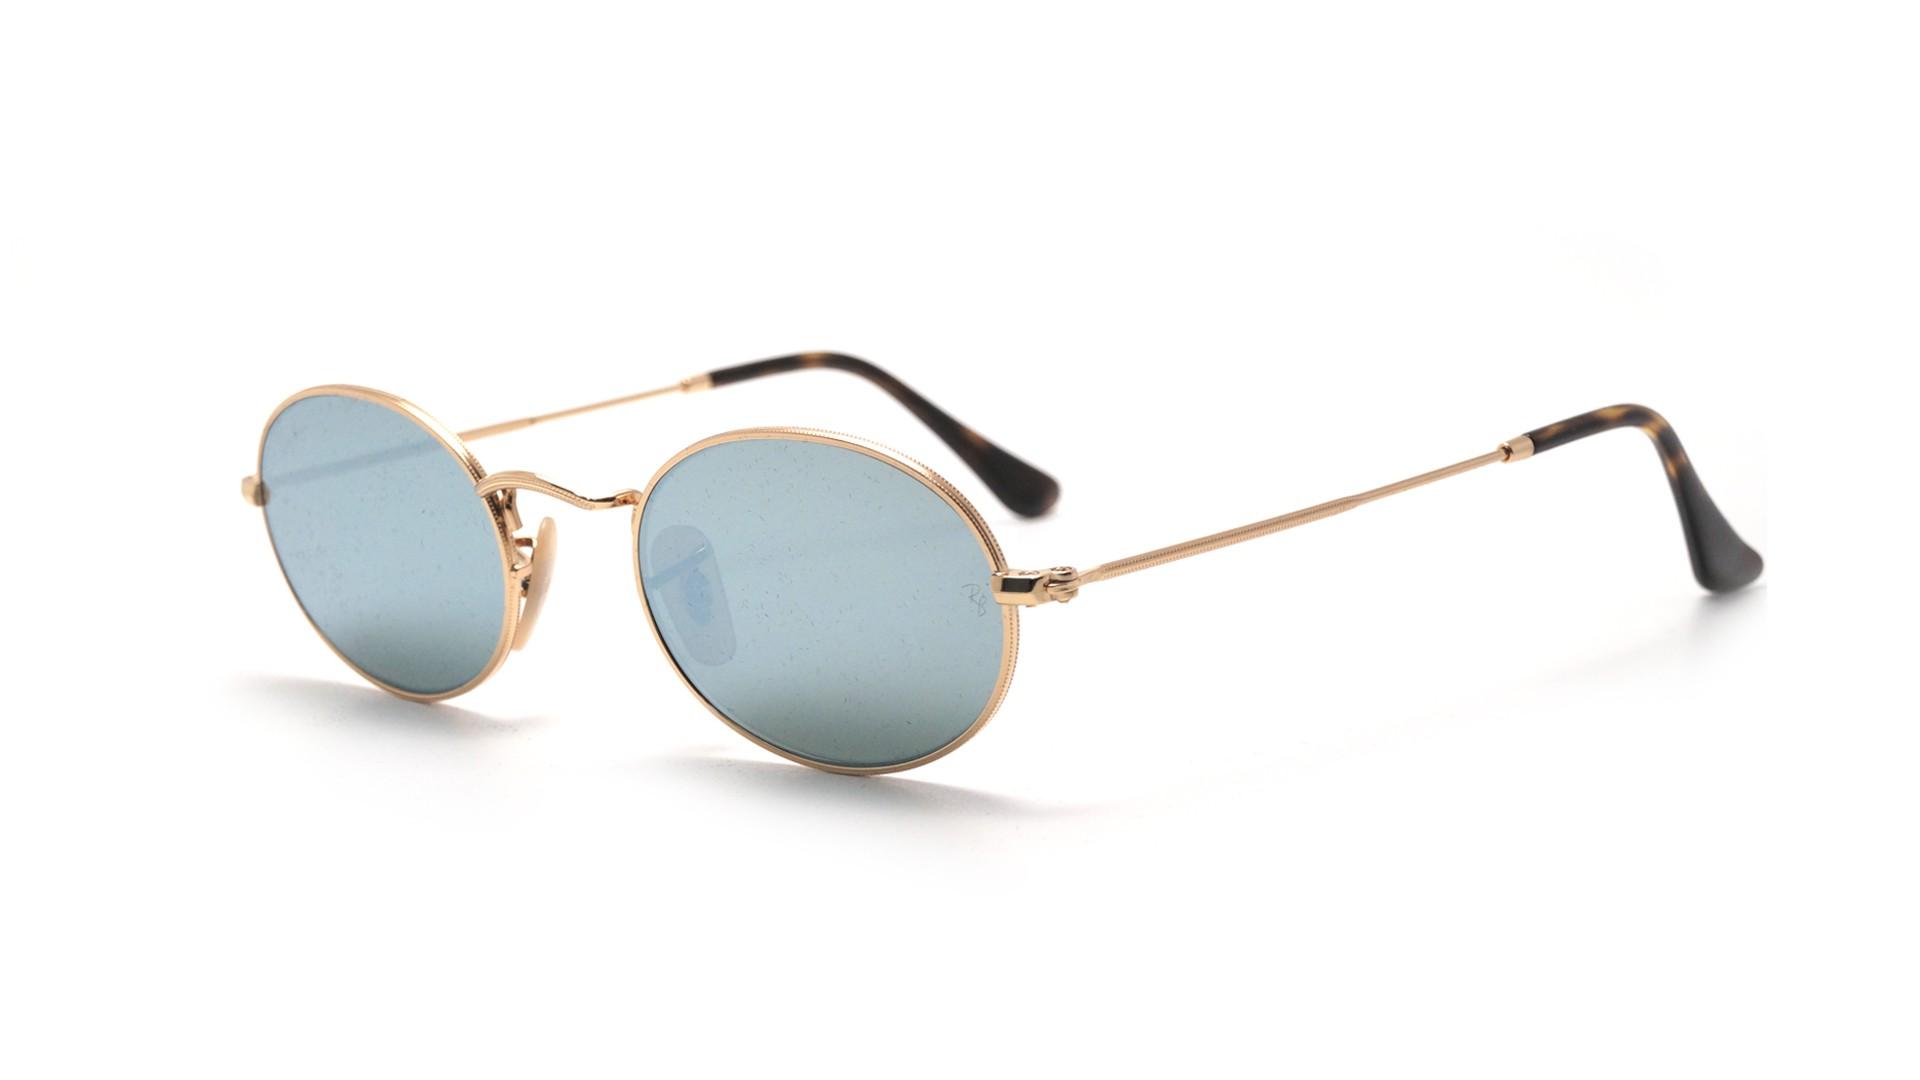 55e6886f9c Sunglasses Ray-Ban RB3547N 001 30 48-21 Gold Small Flash